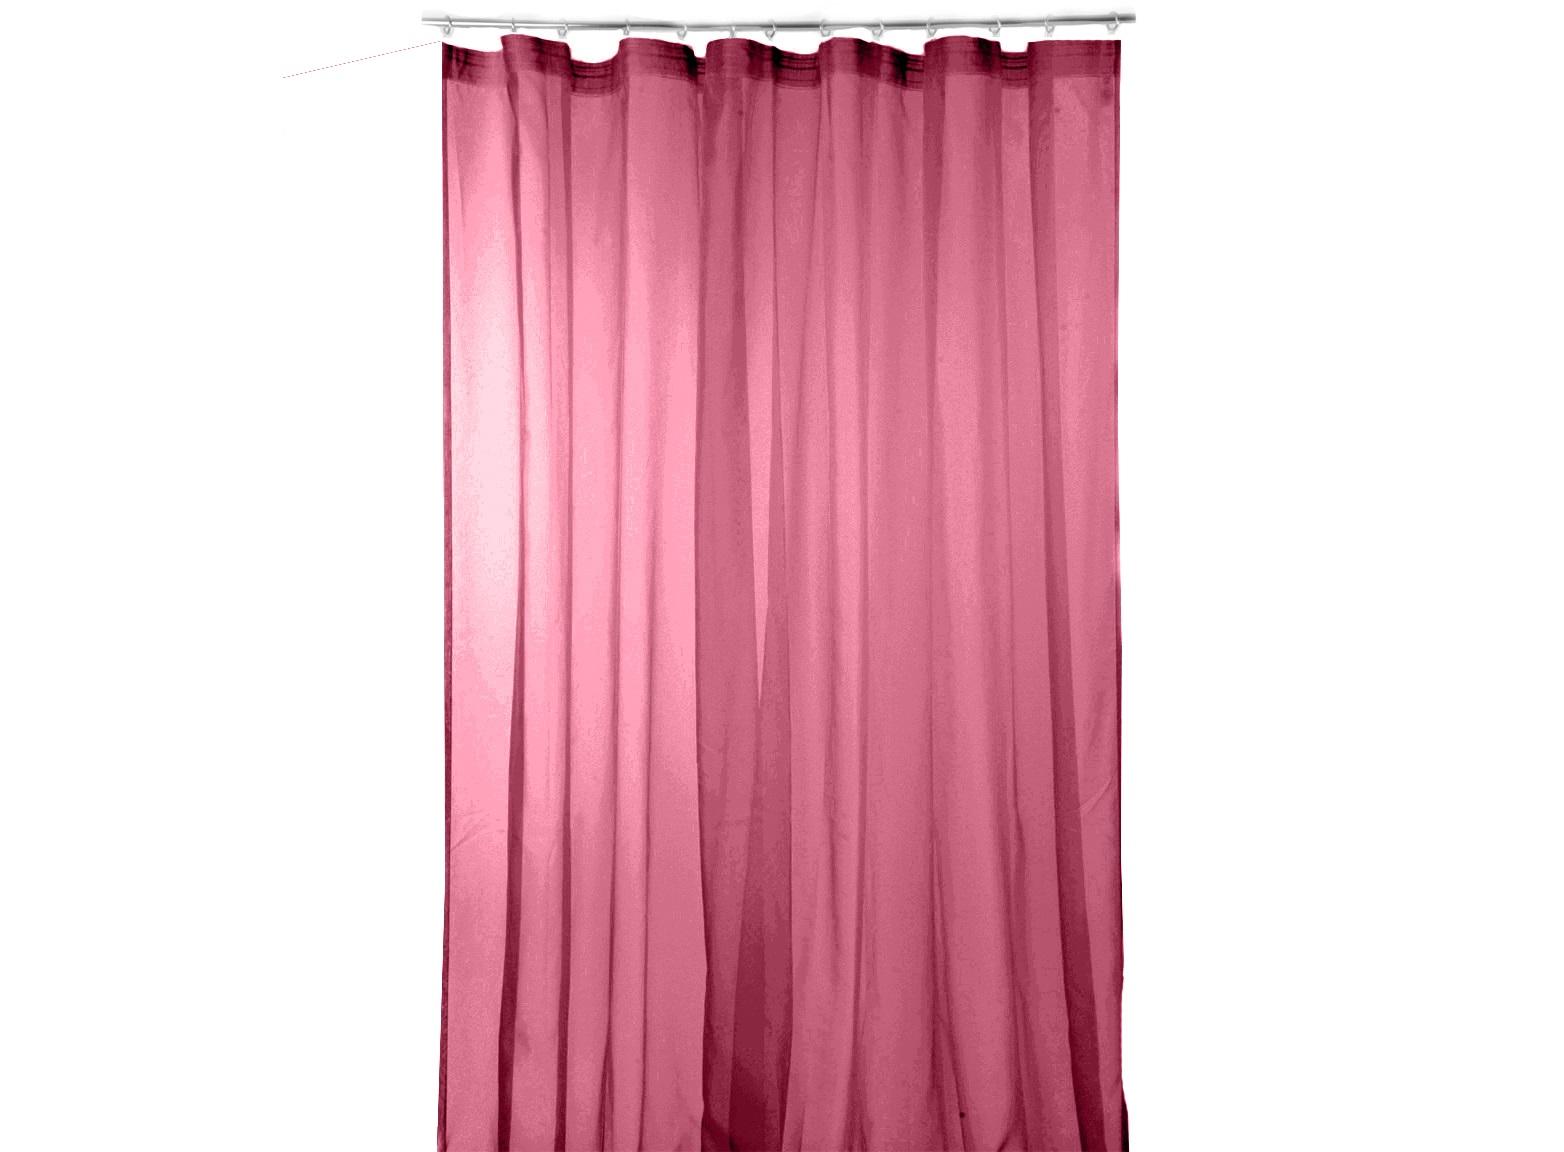 Вуаль Пьяная вишняШторы<br>Тюль легкая на окно на тесьме для крючков.<br><br>Material: Тюль<br>Width см: 300<br>Height см: 270